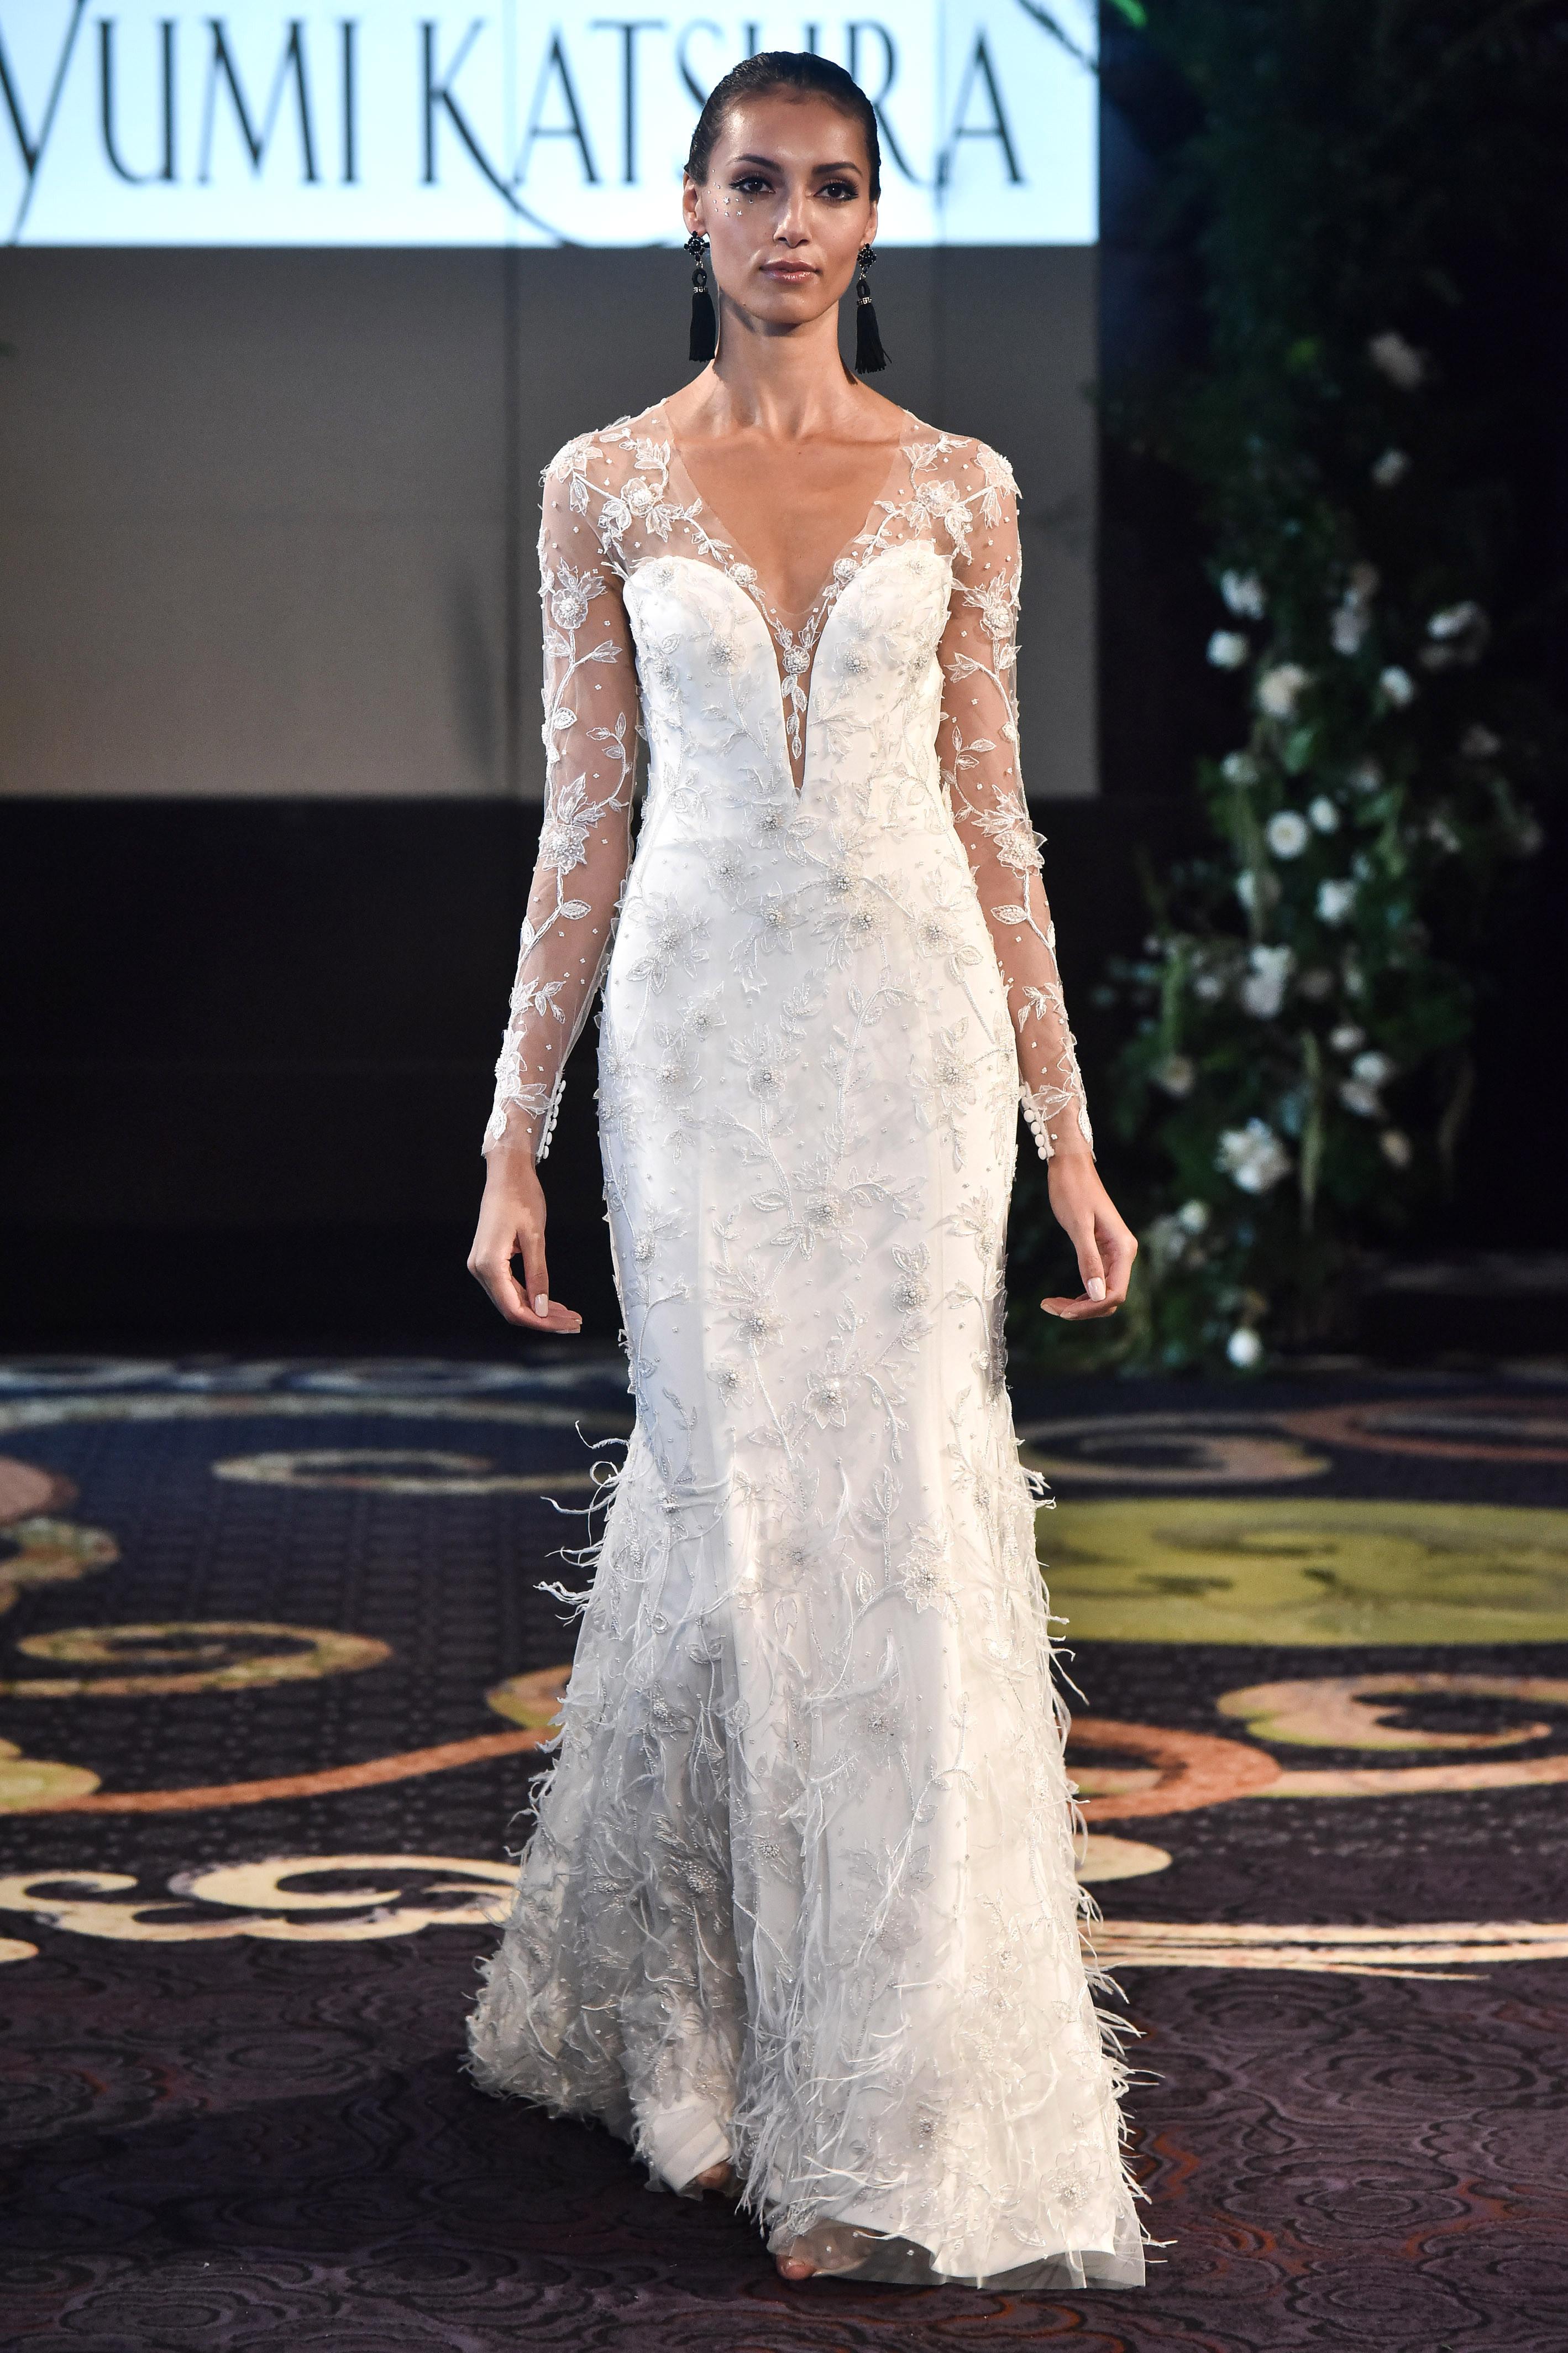 yumi katsura fall 2018 overlay long sleeve wedding dress